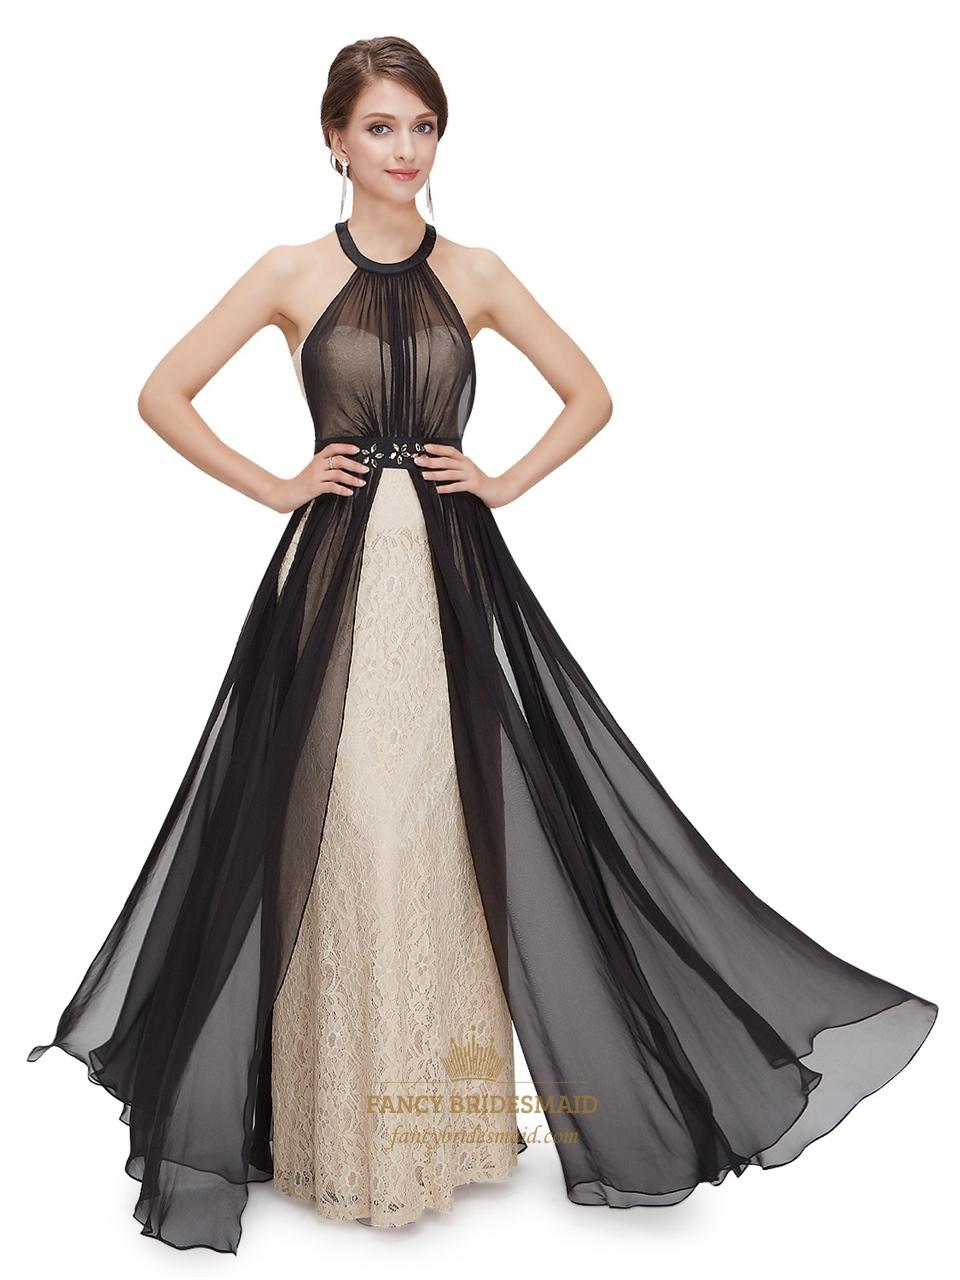 Black and champagne halter bridesmaid dresses with beaded waist black and champagne halter bridesmaid dresses with beaded waist ombrellifo Images